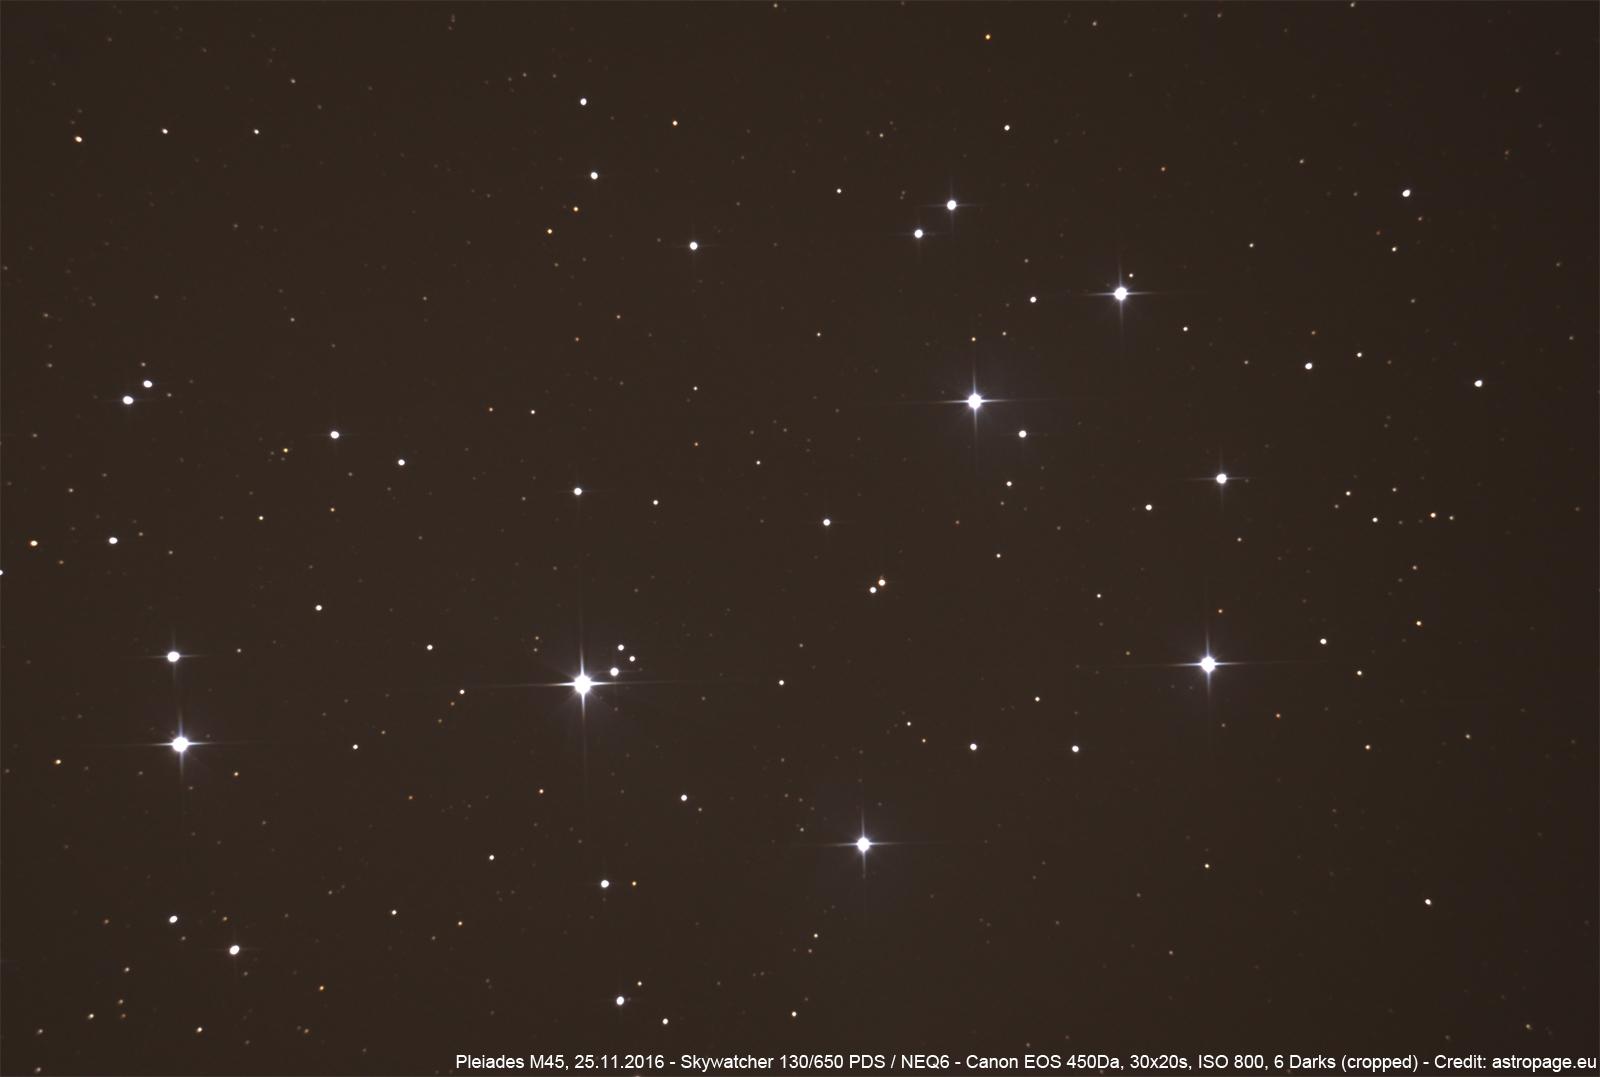 Plejaden M45 vom 25.11.2016. (astropage.eu)